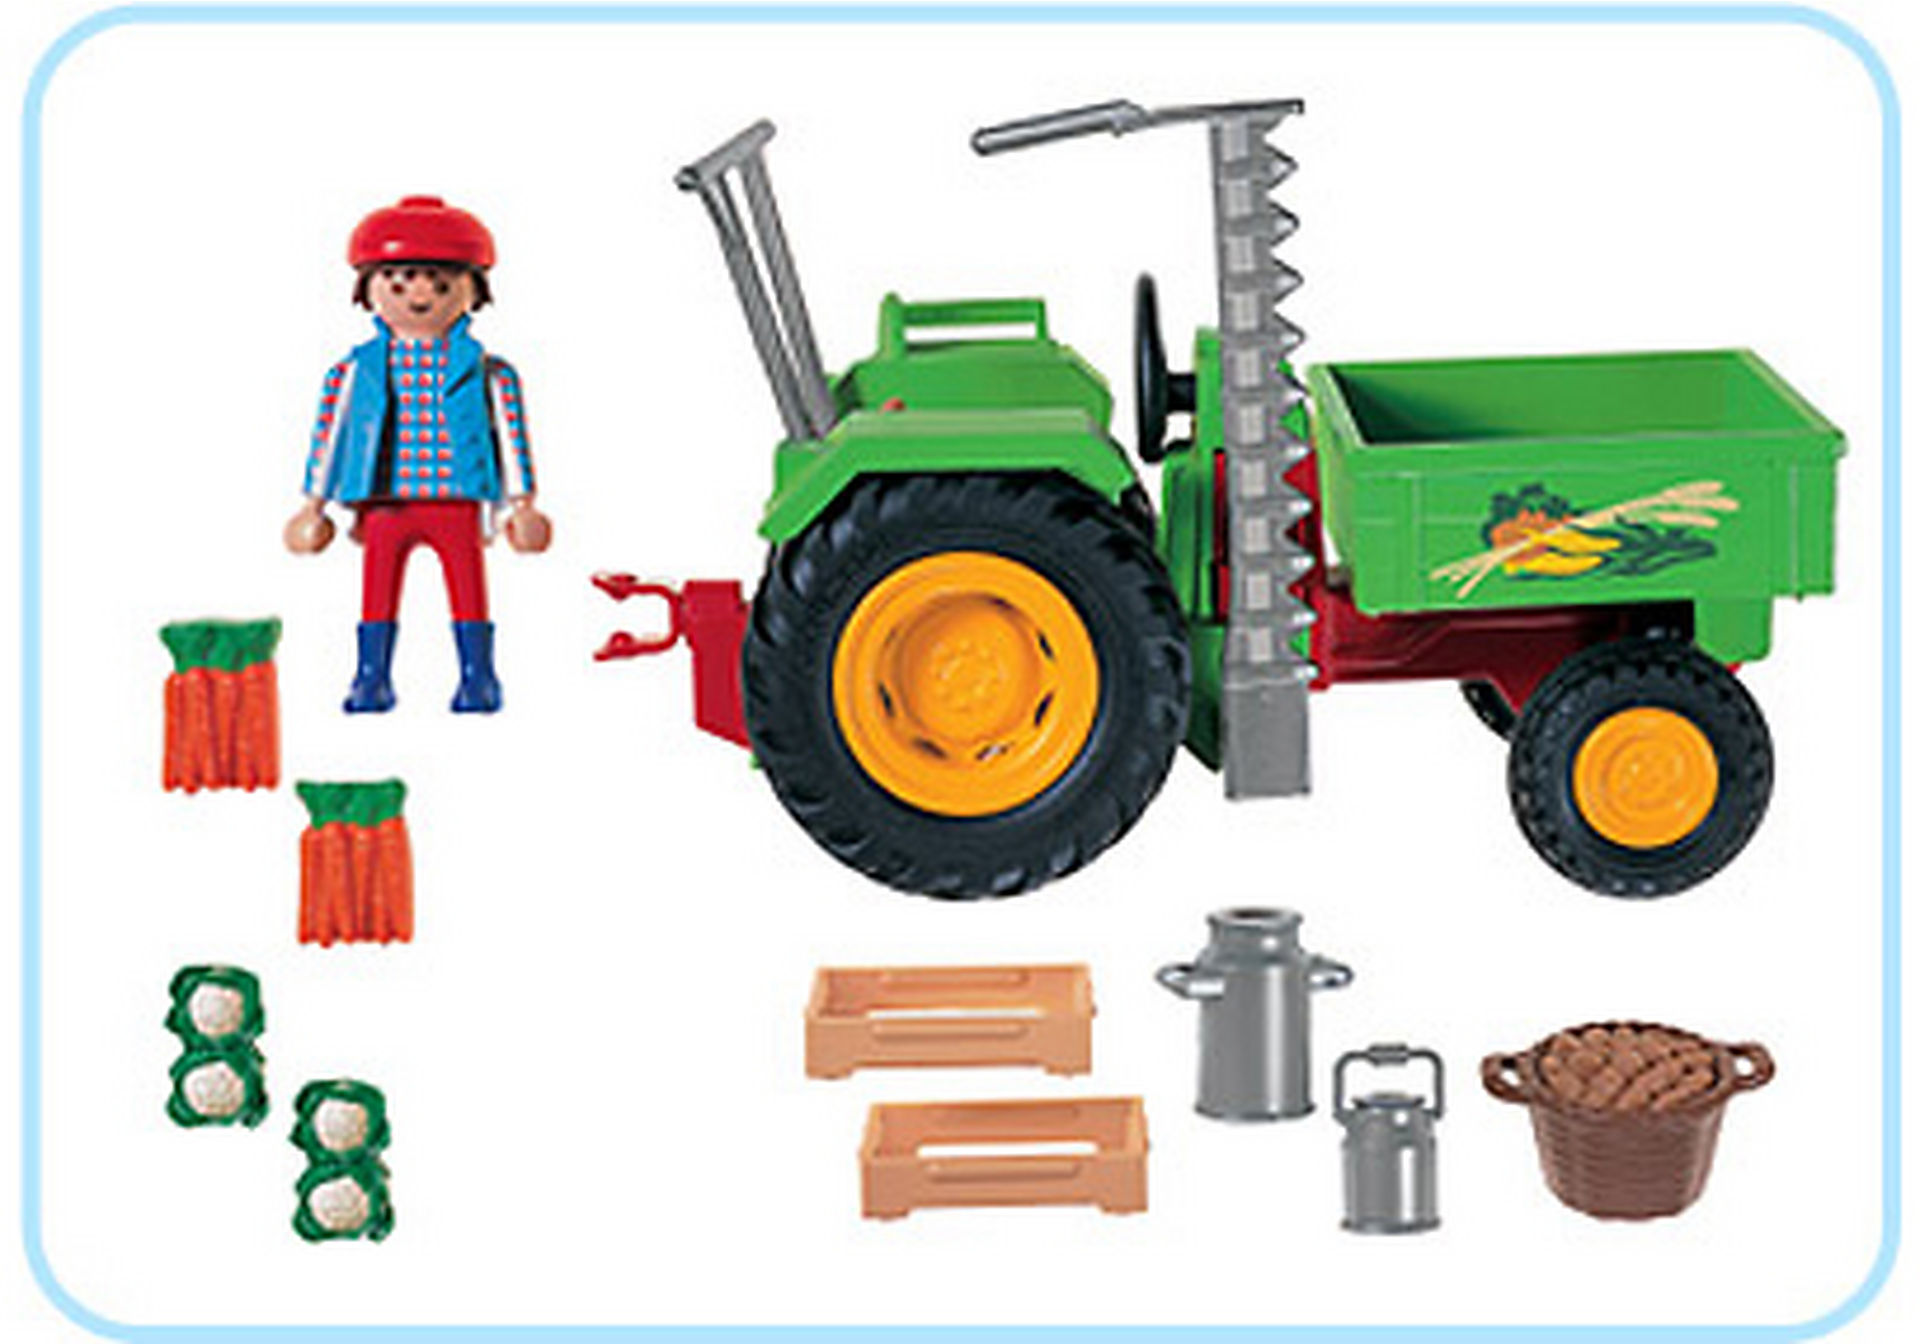 3074-A Traktor mit Ladefläche zoom image2